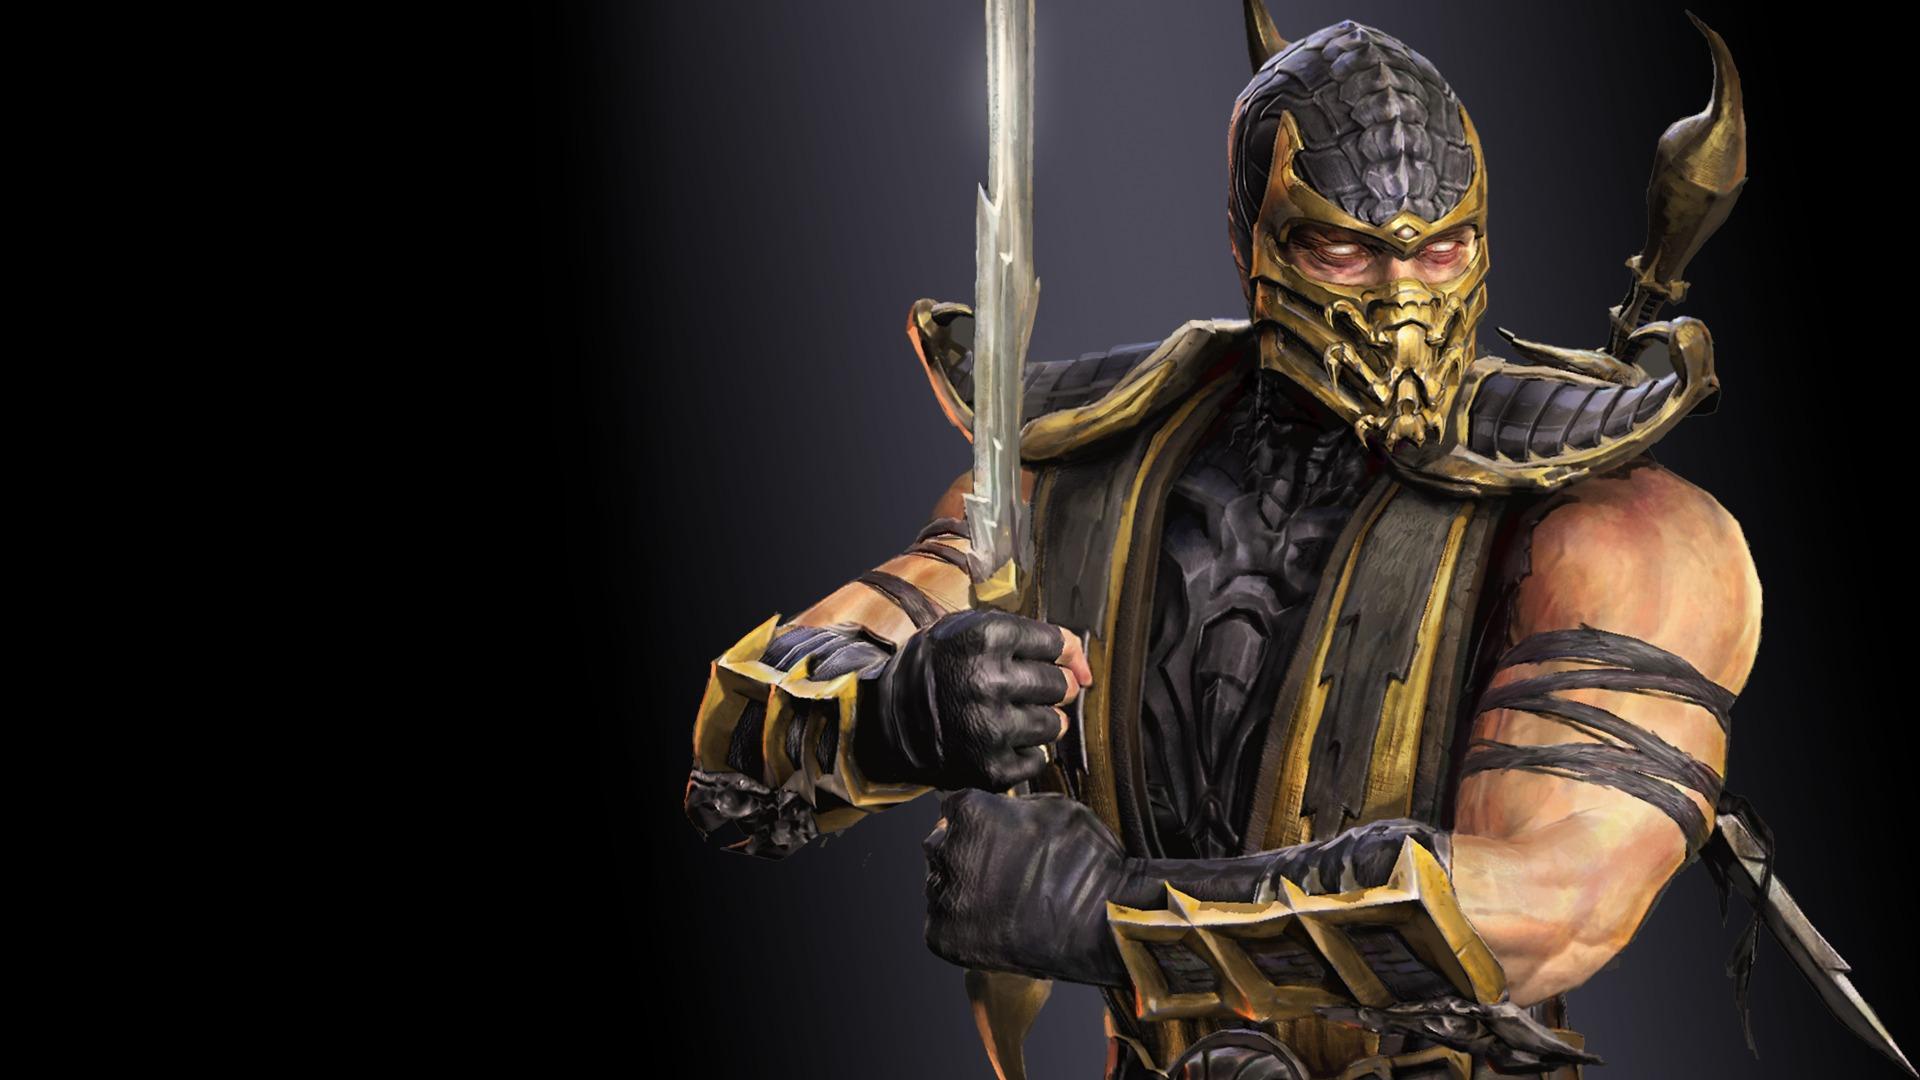 Wallpaper Ninja Warrior Mortal Kombat Ghost Machine